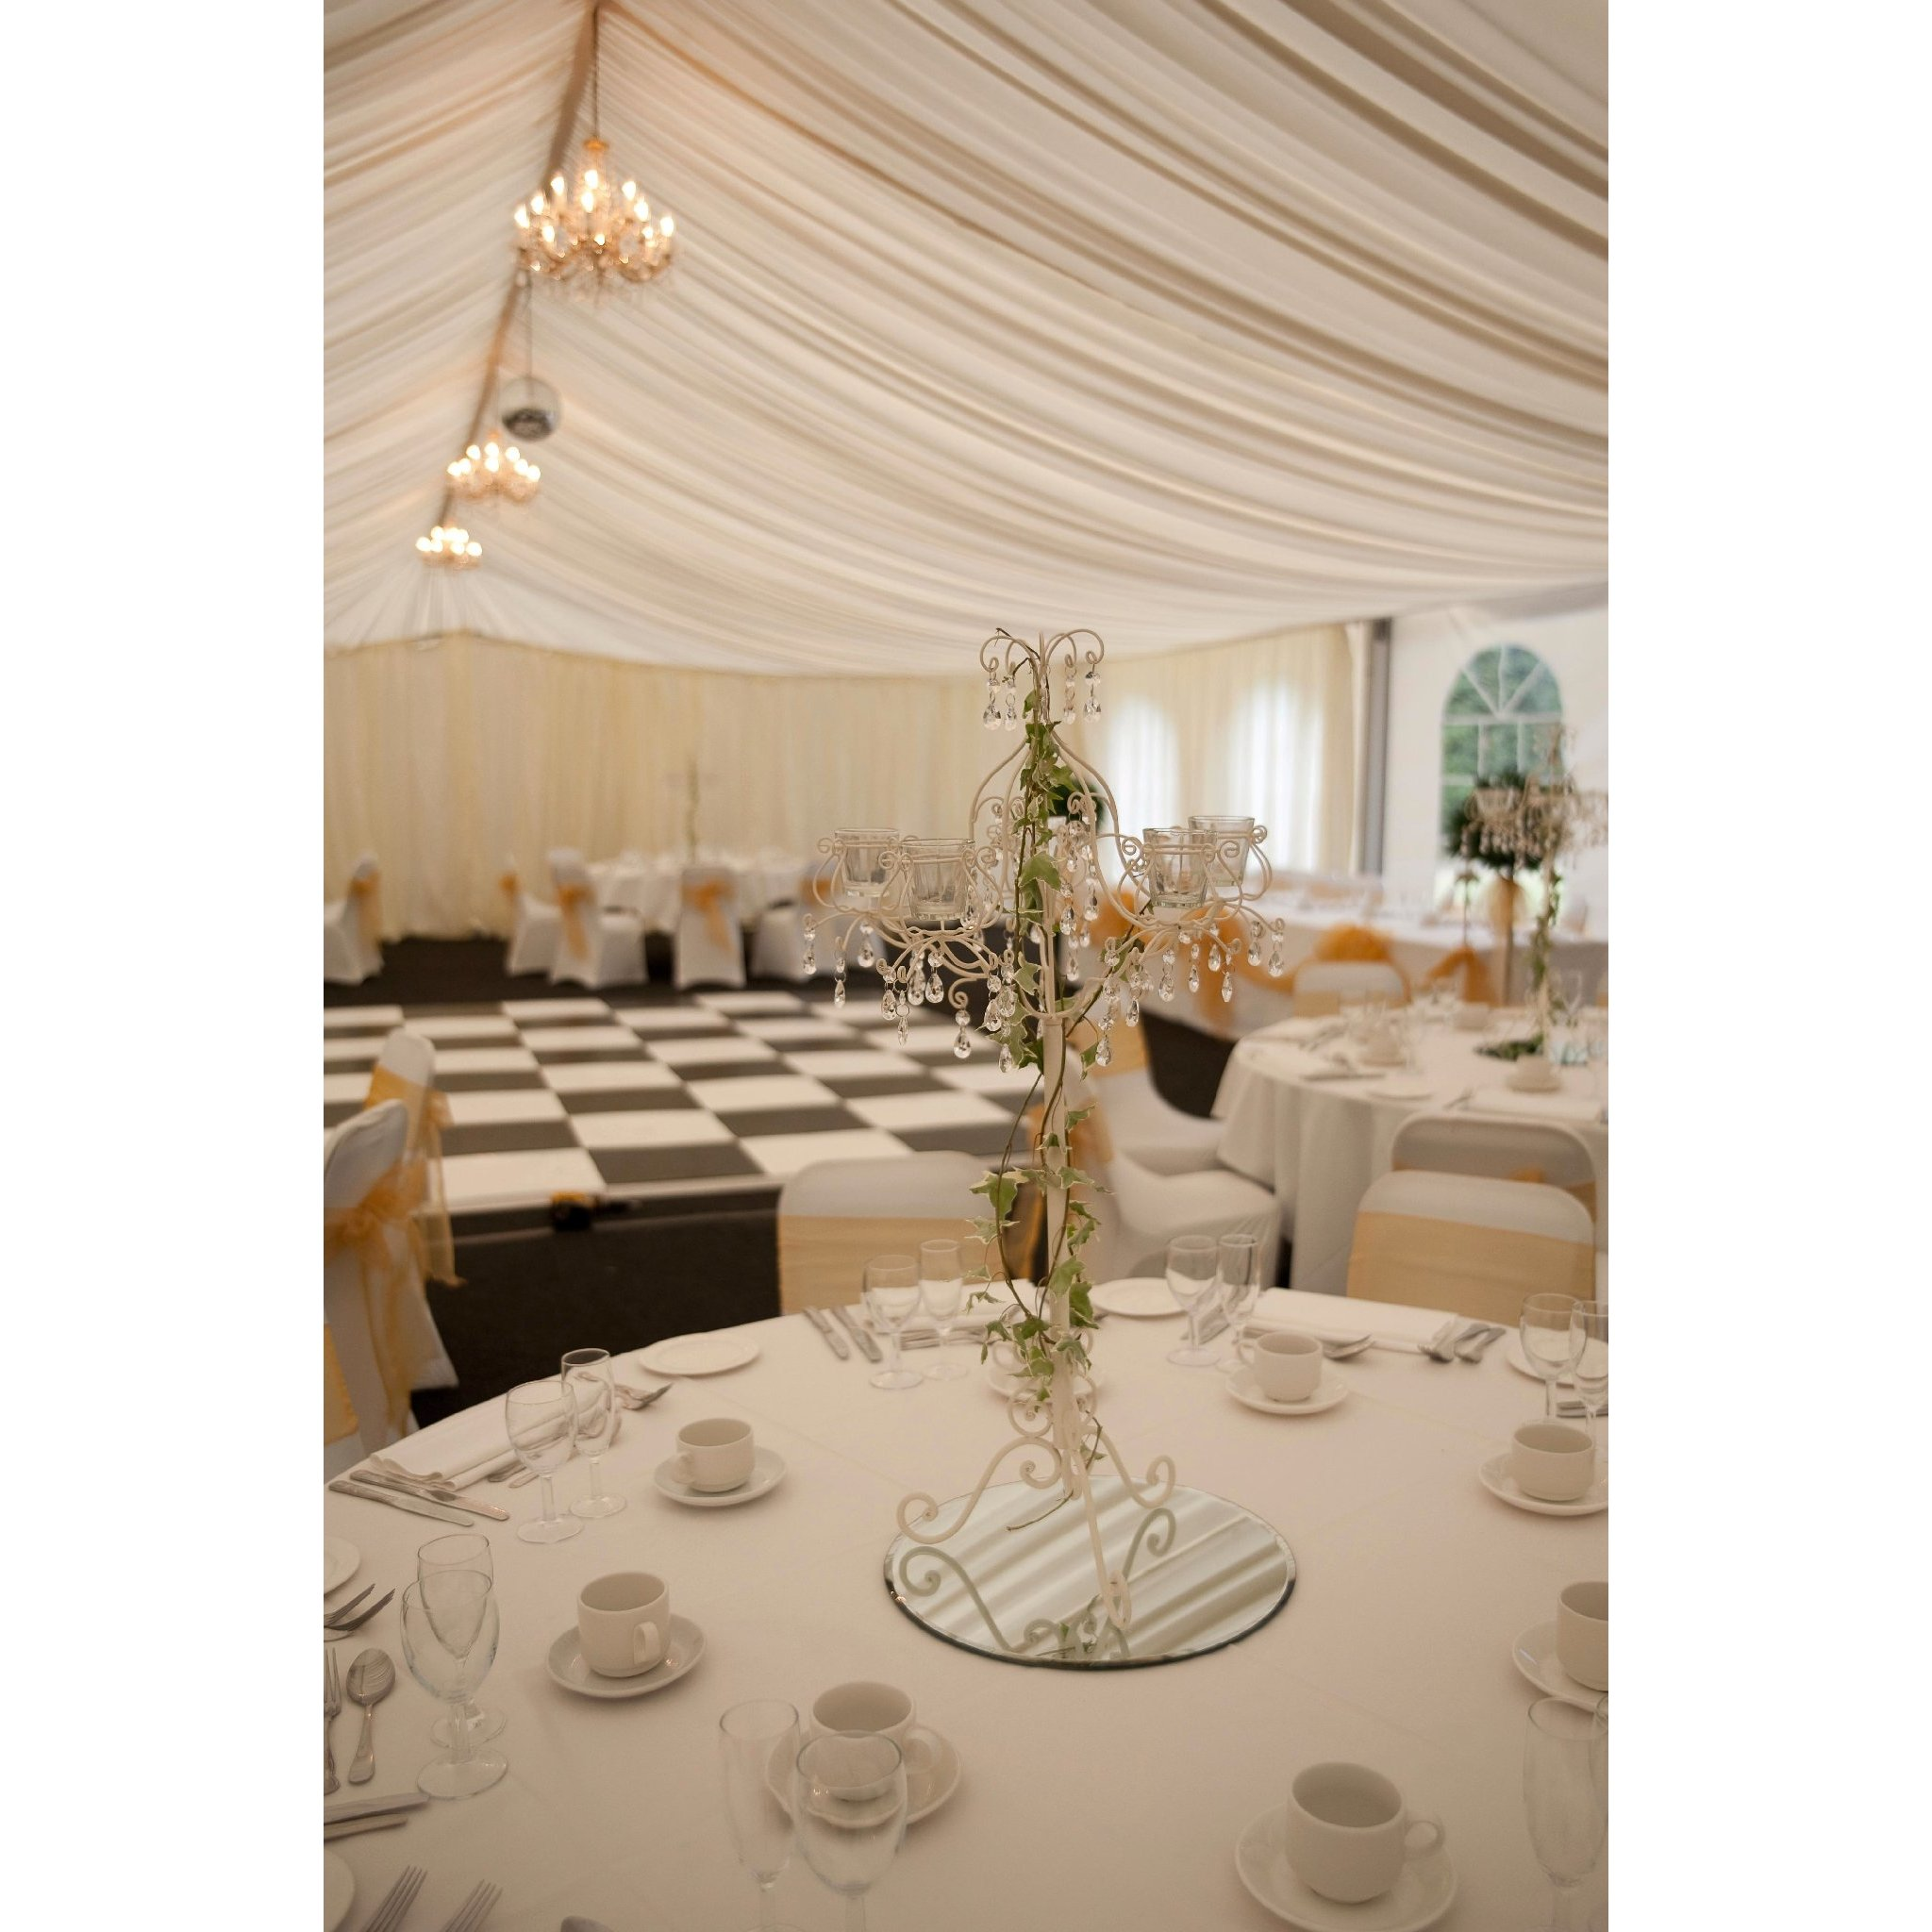 The Halfway House Brentwood Restaurants Brentwood United Kingdom Tel 01277811